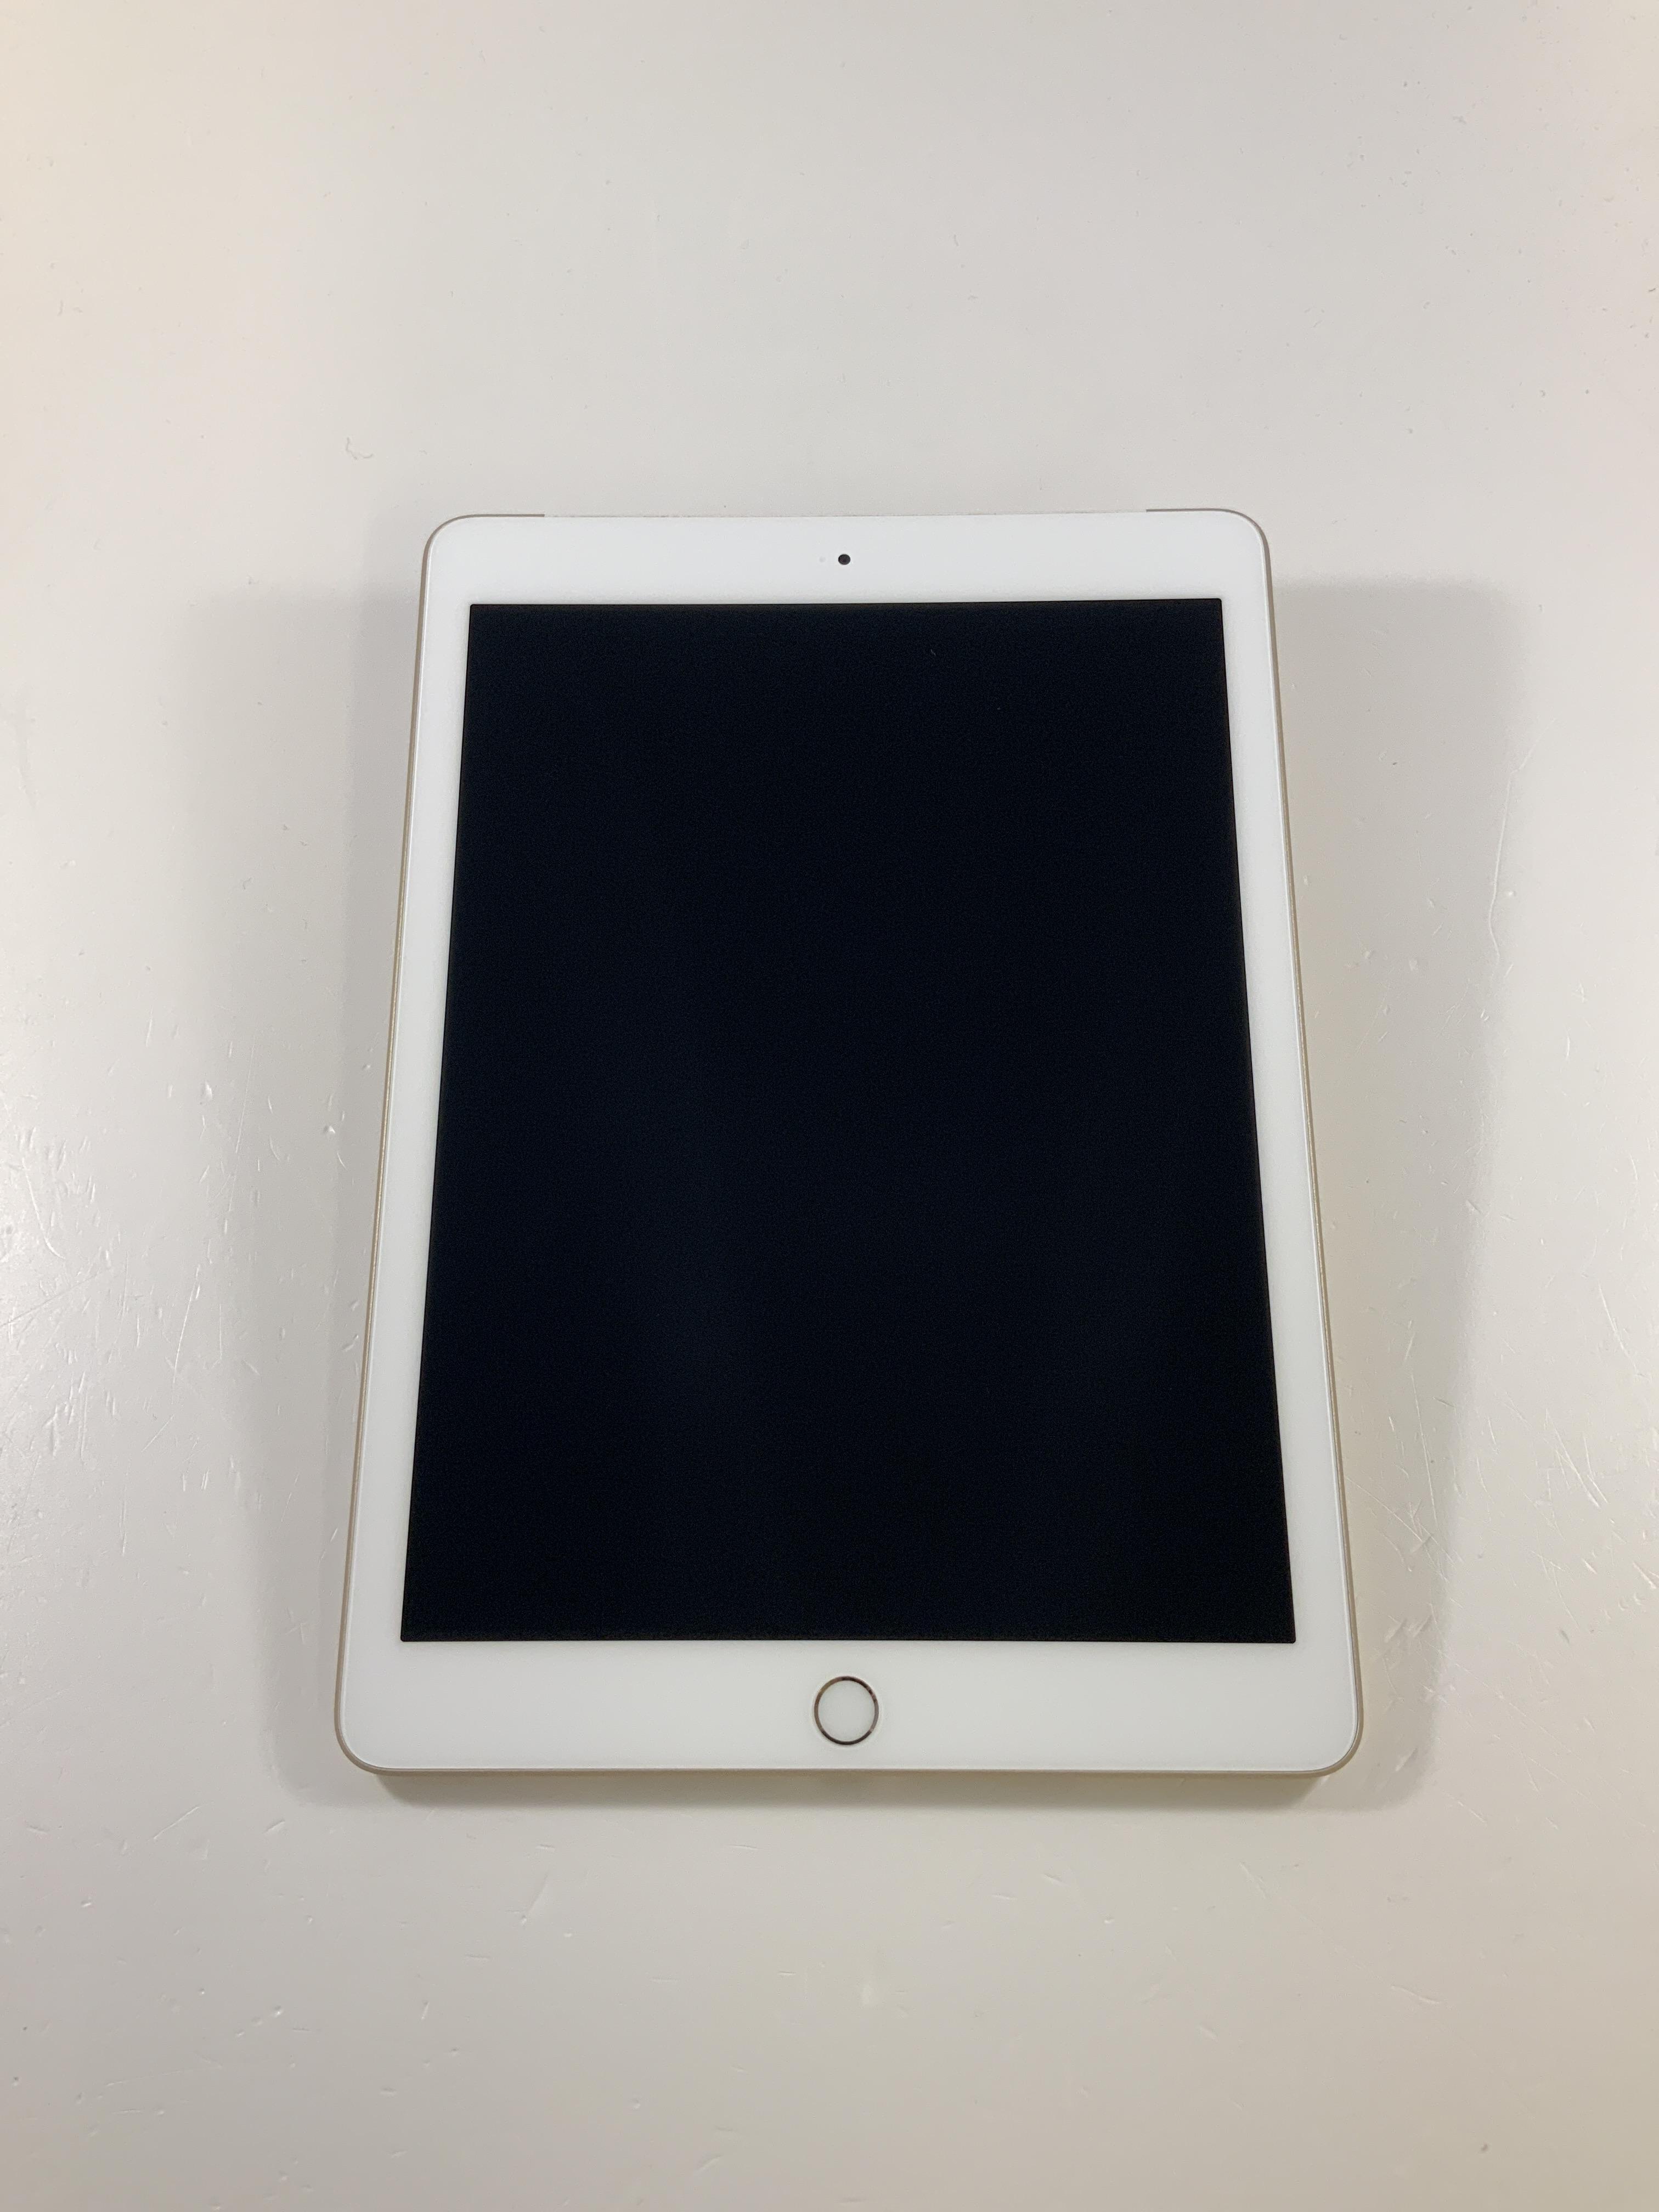 iPad 5 Wi-Fi + Cellular 128GB, 128GB, Gold, imagen 1